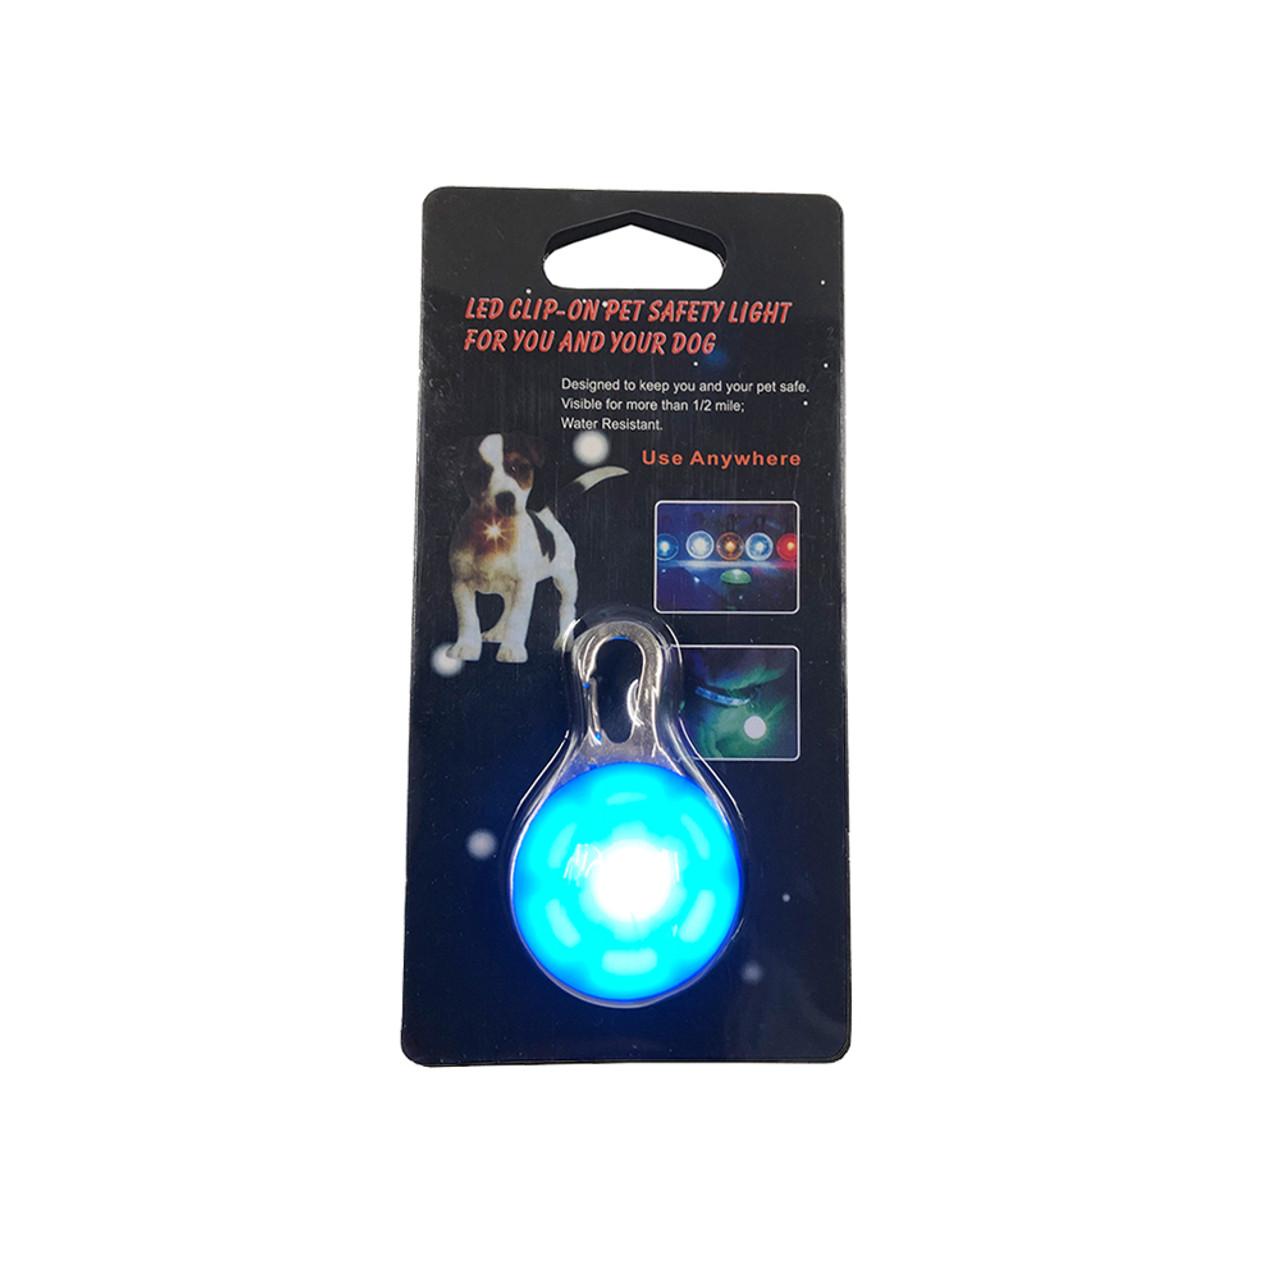 LED Clip-On Dog Safety Light